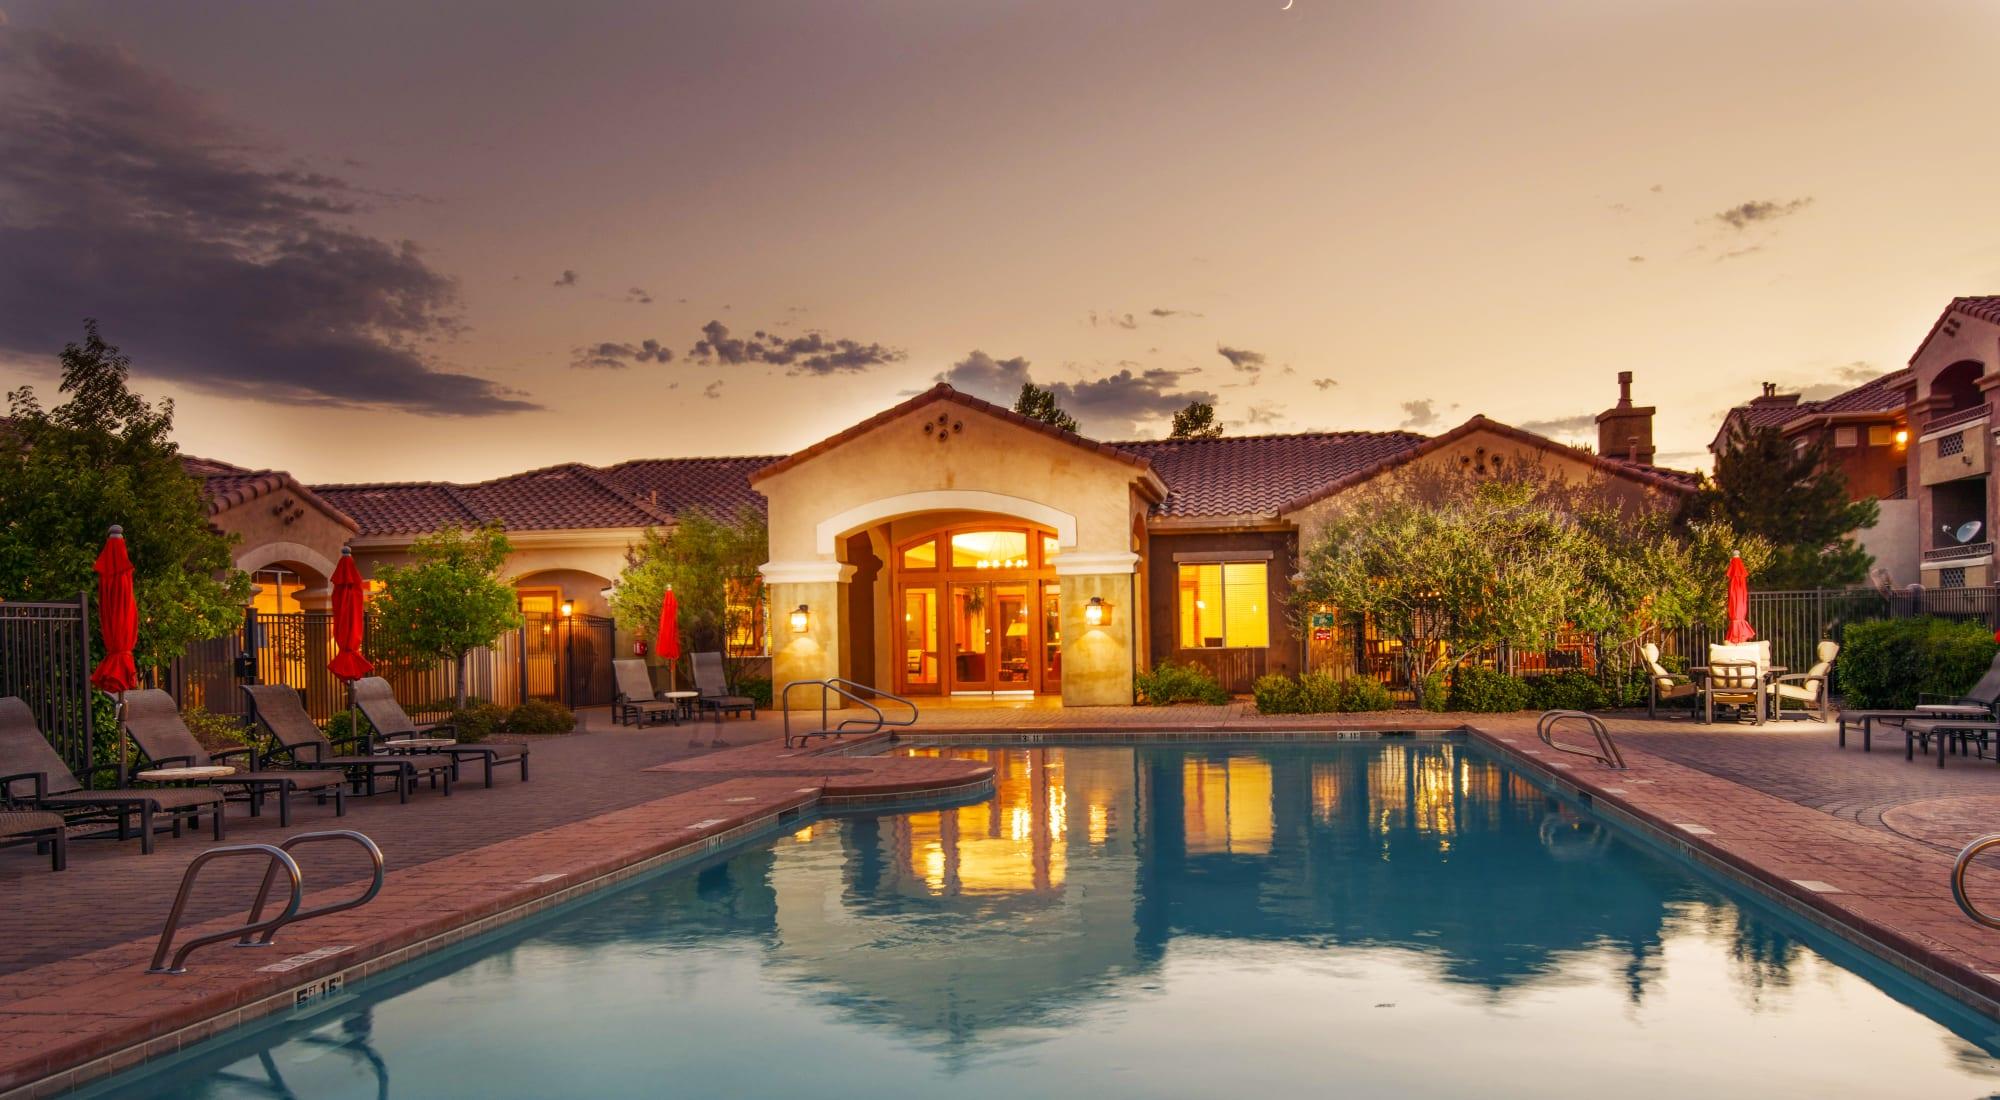 Apartments at Broadstone Towne Center in Albuquerque, New Mexico